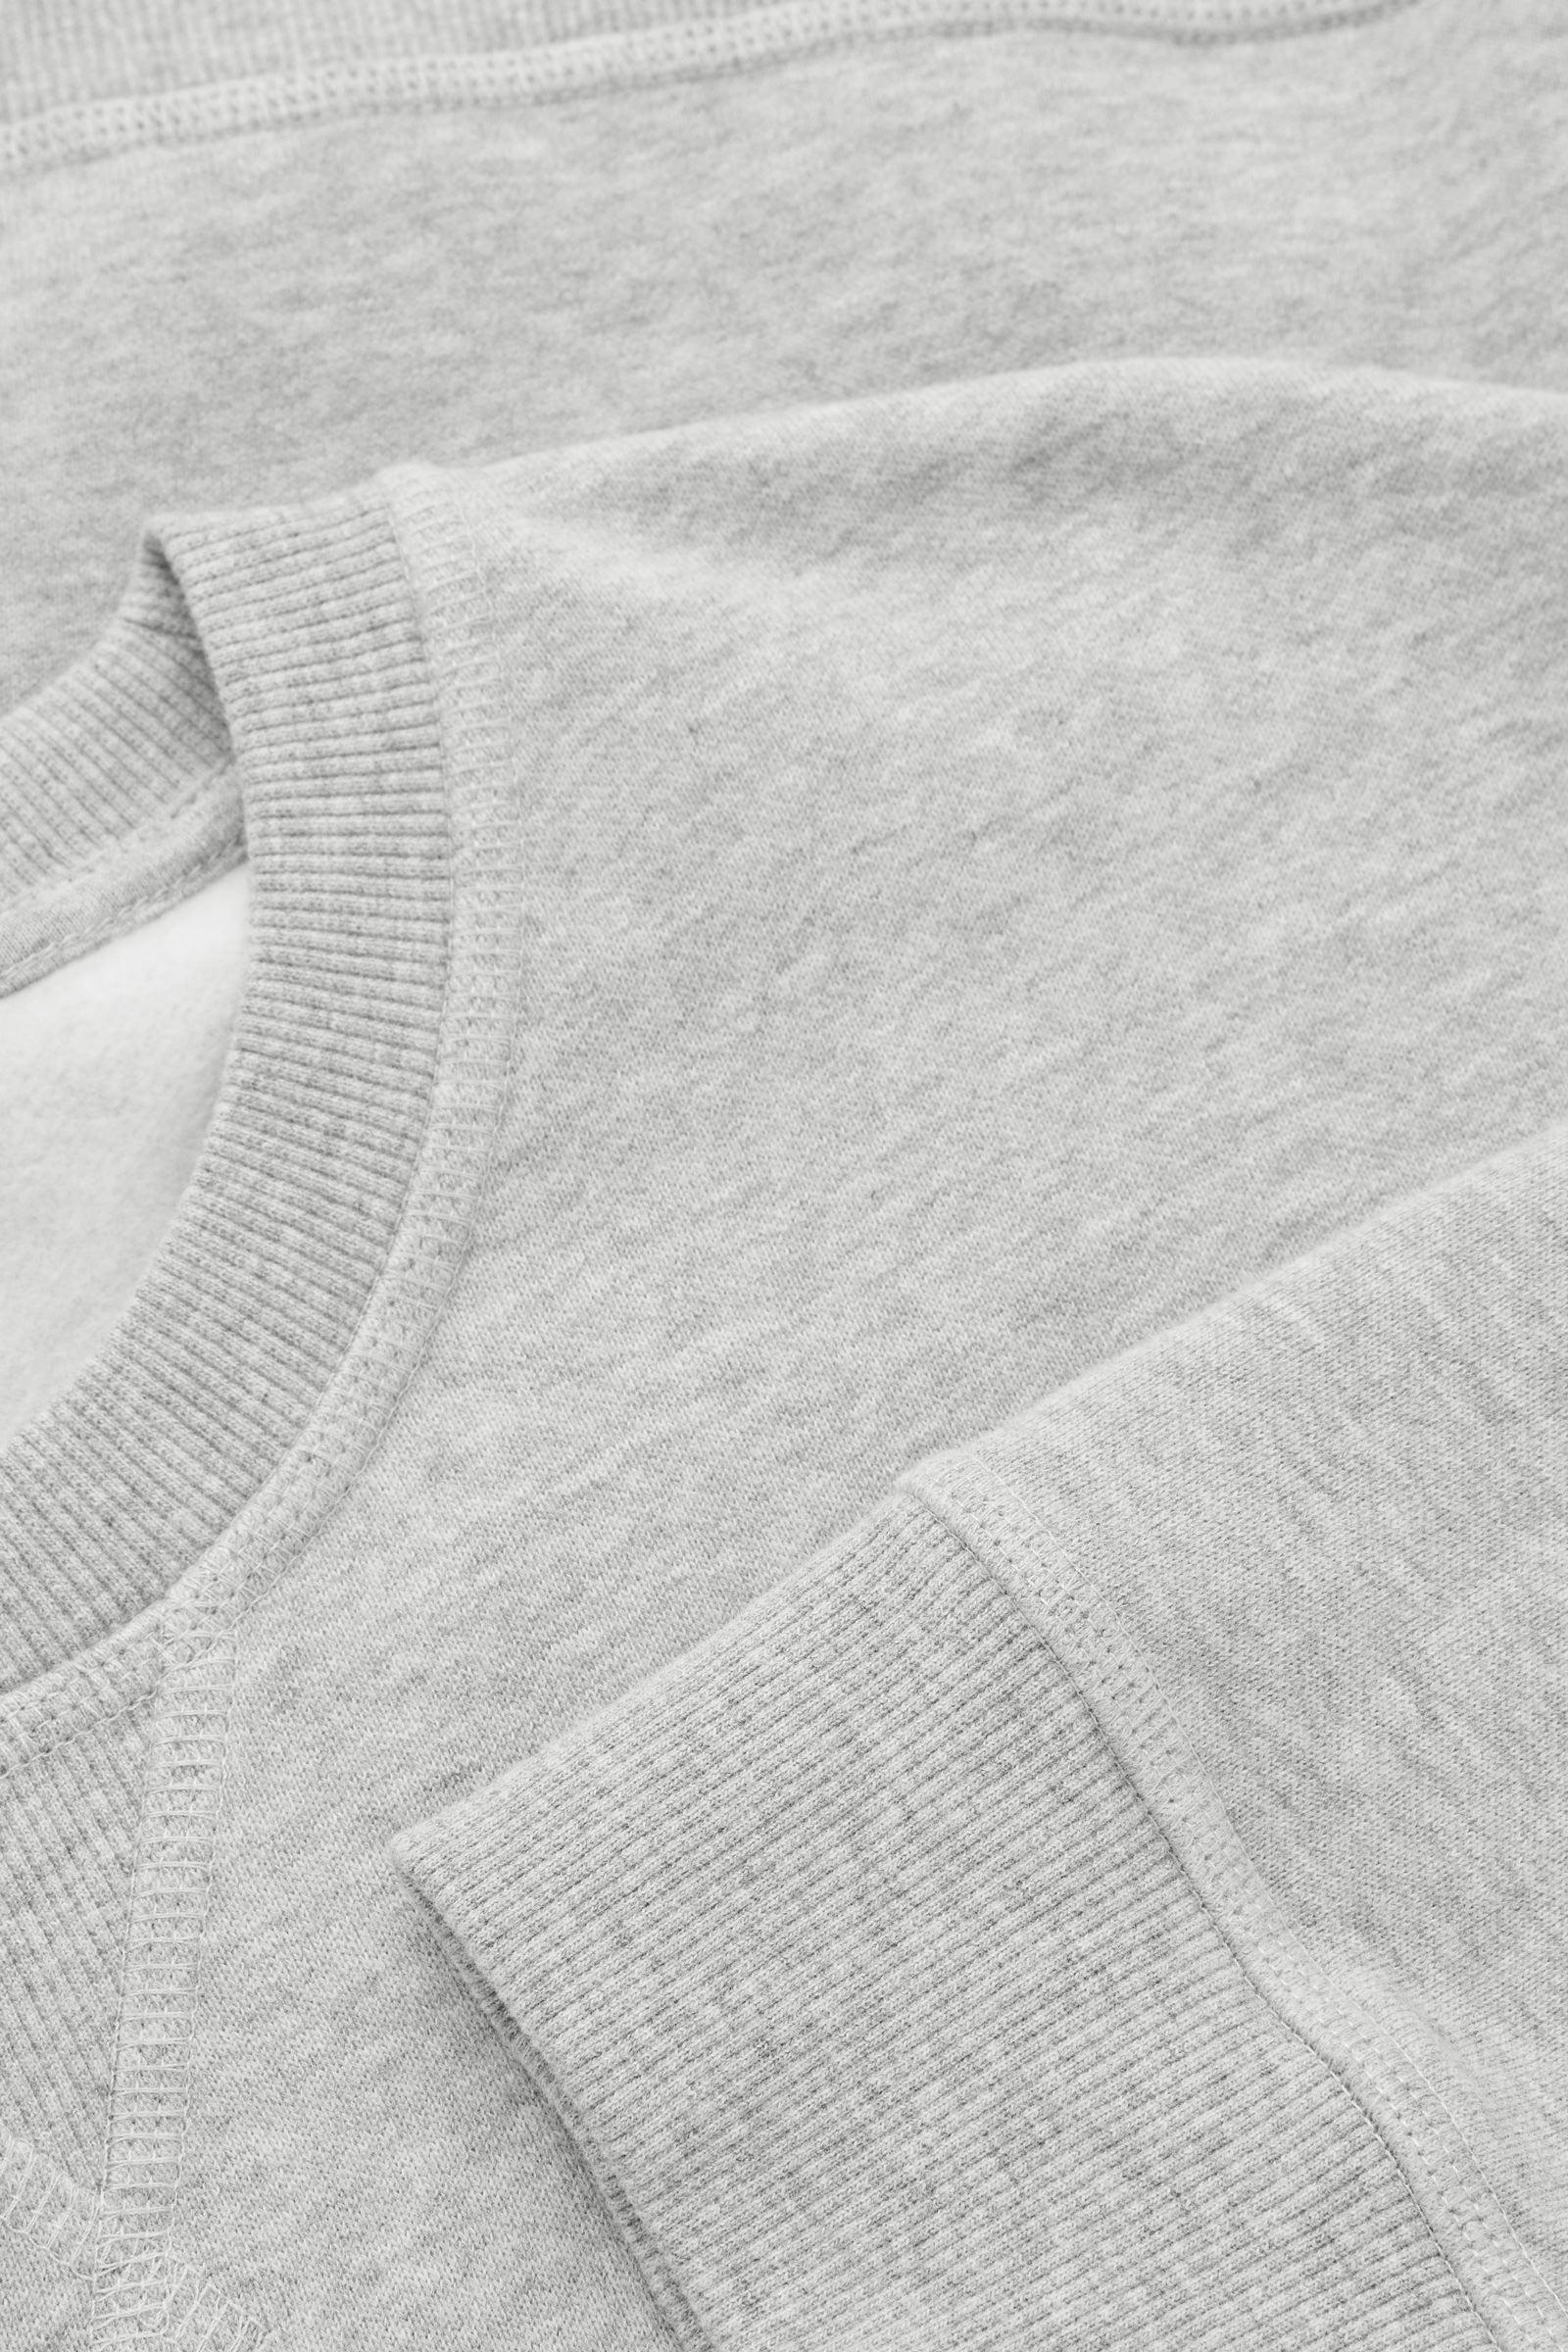 COS 릴랙스드 핏 스웻셔츠의 라이트 그레이 멜란지컬러 Detail입니다.